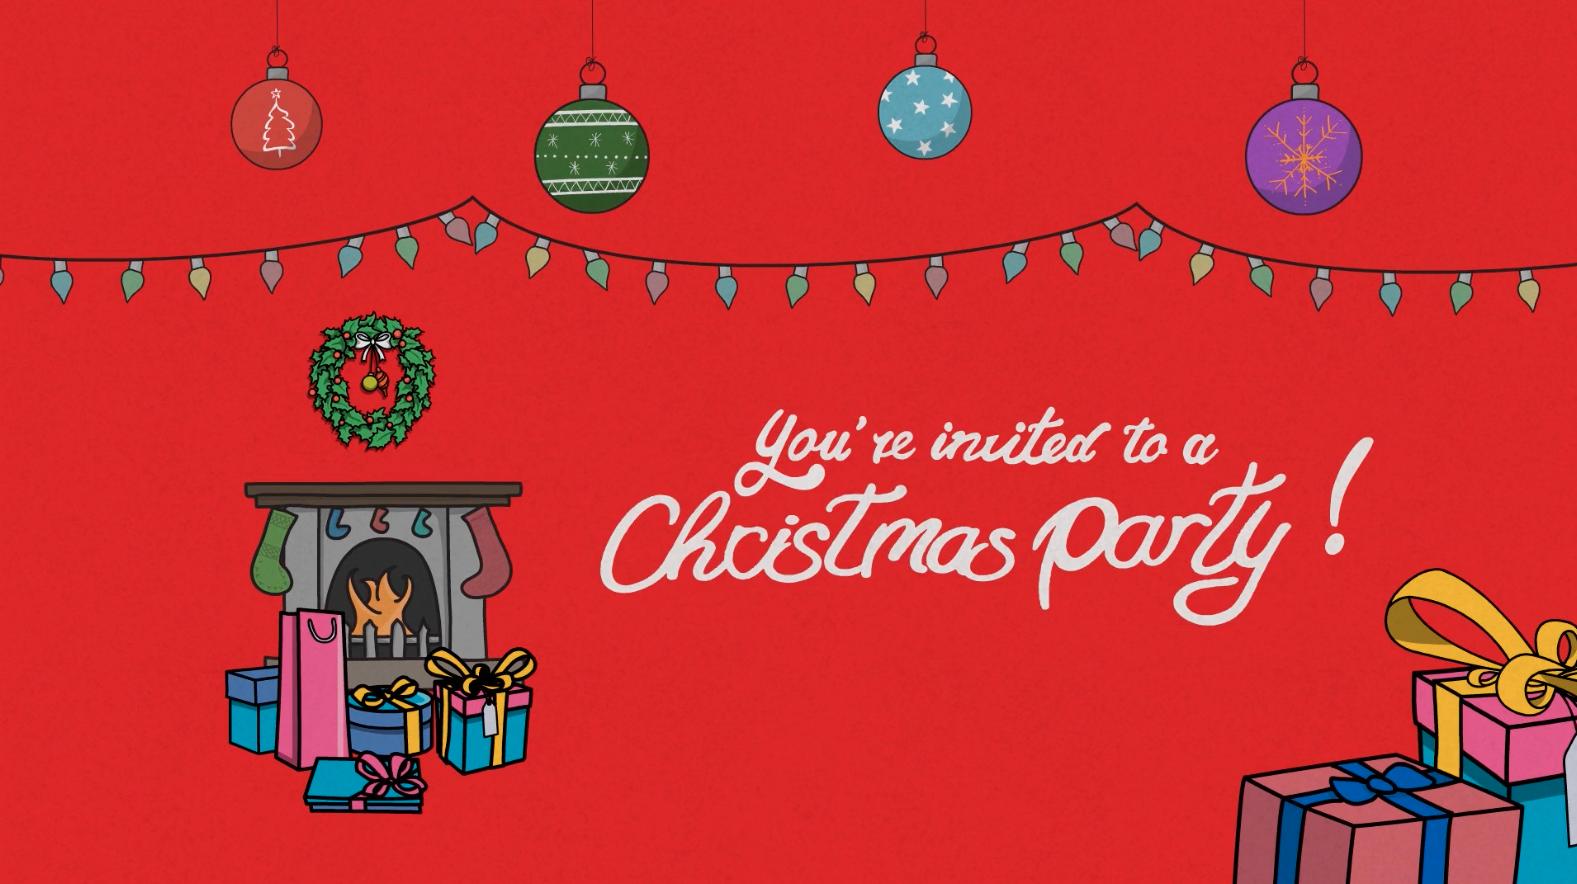 7 Fantastically festive customizable holiday video templates